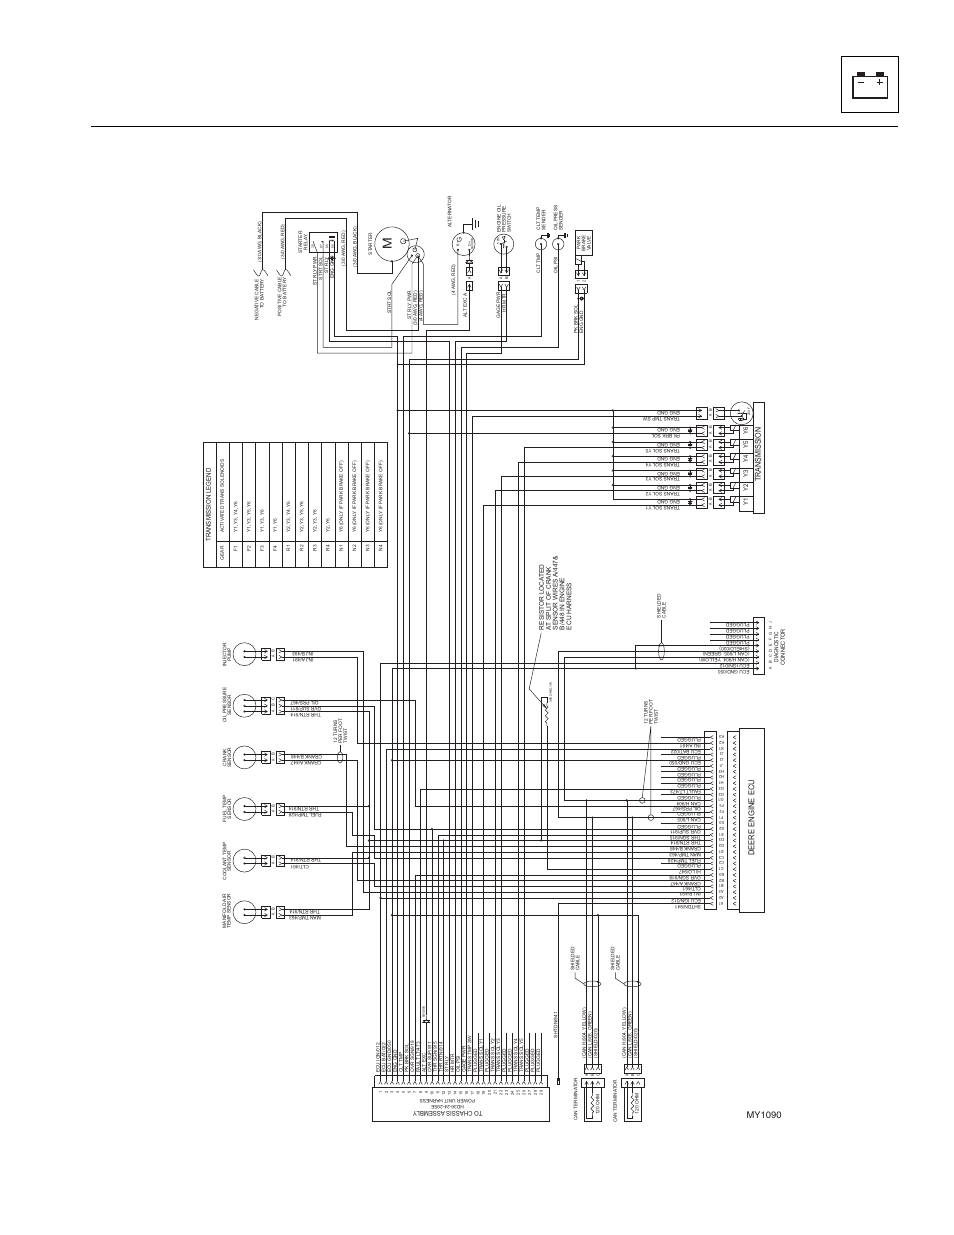 hight resolution of 10 power unit schematic john deere power unit schematic john deere my1090